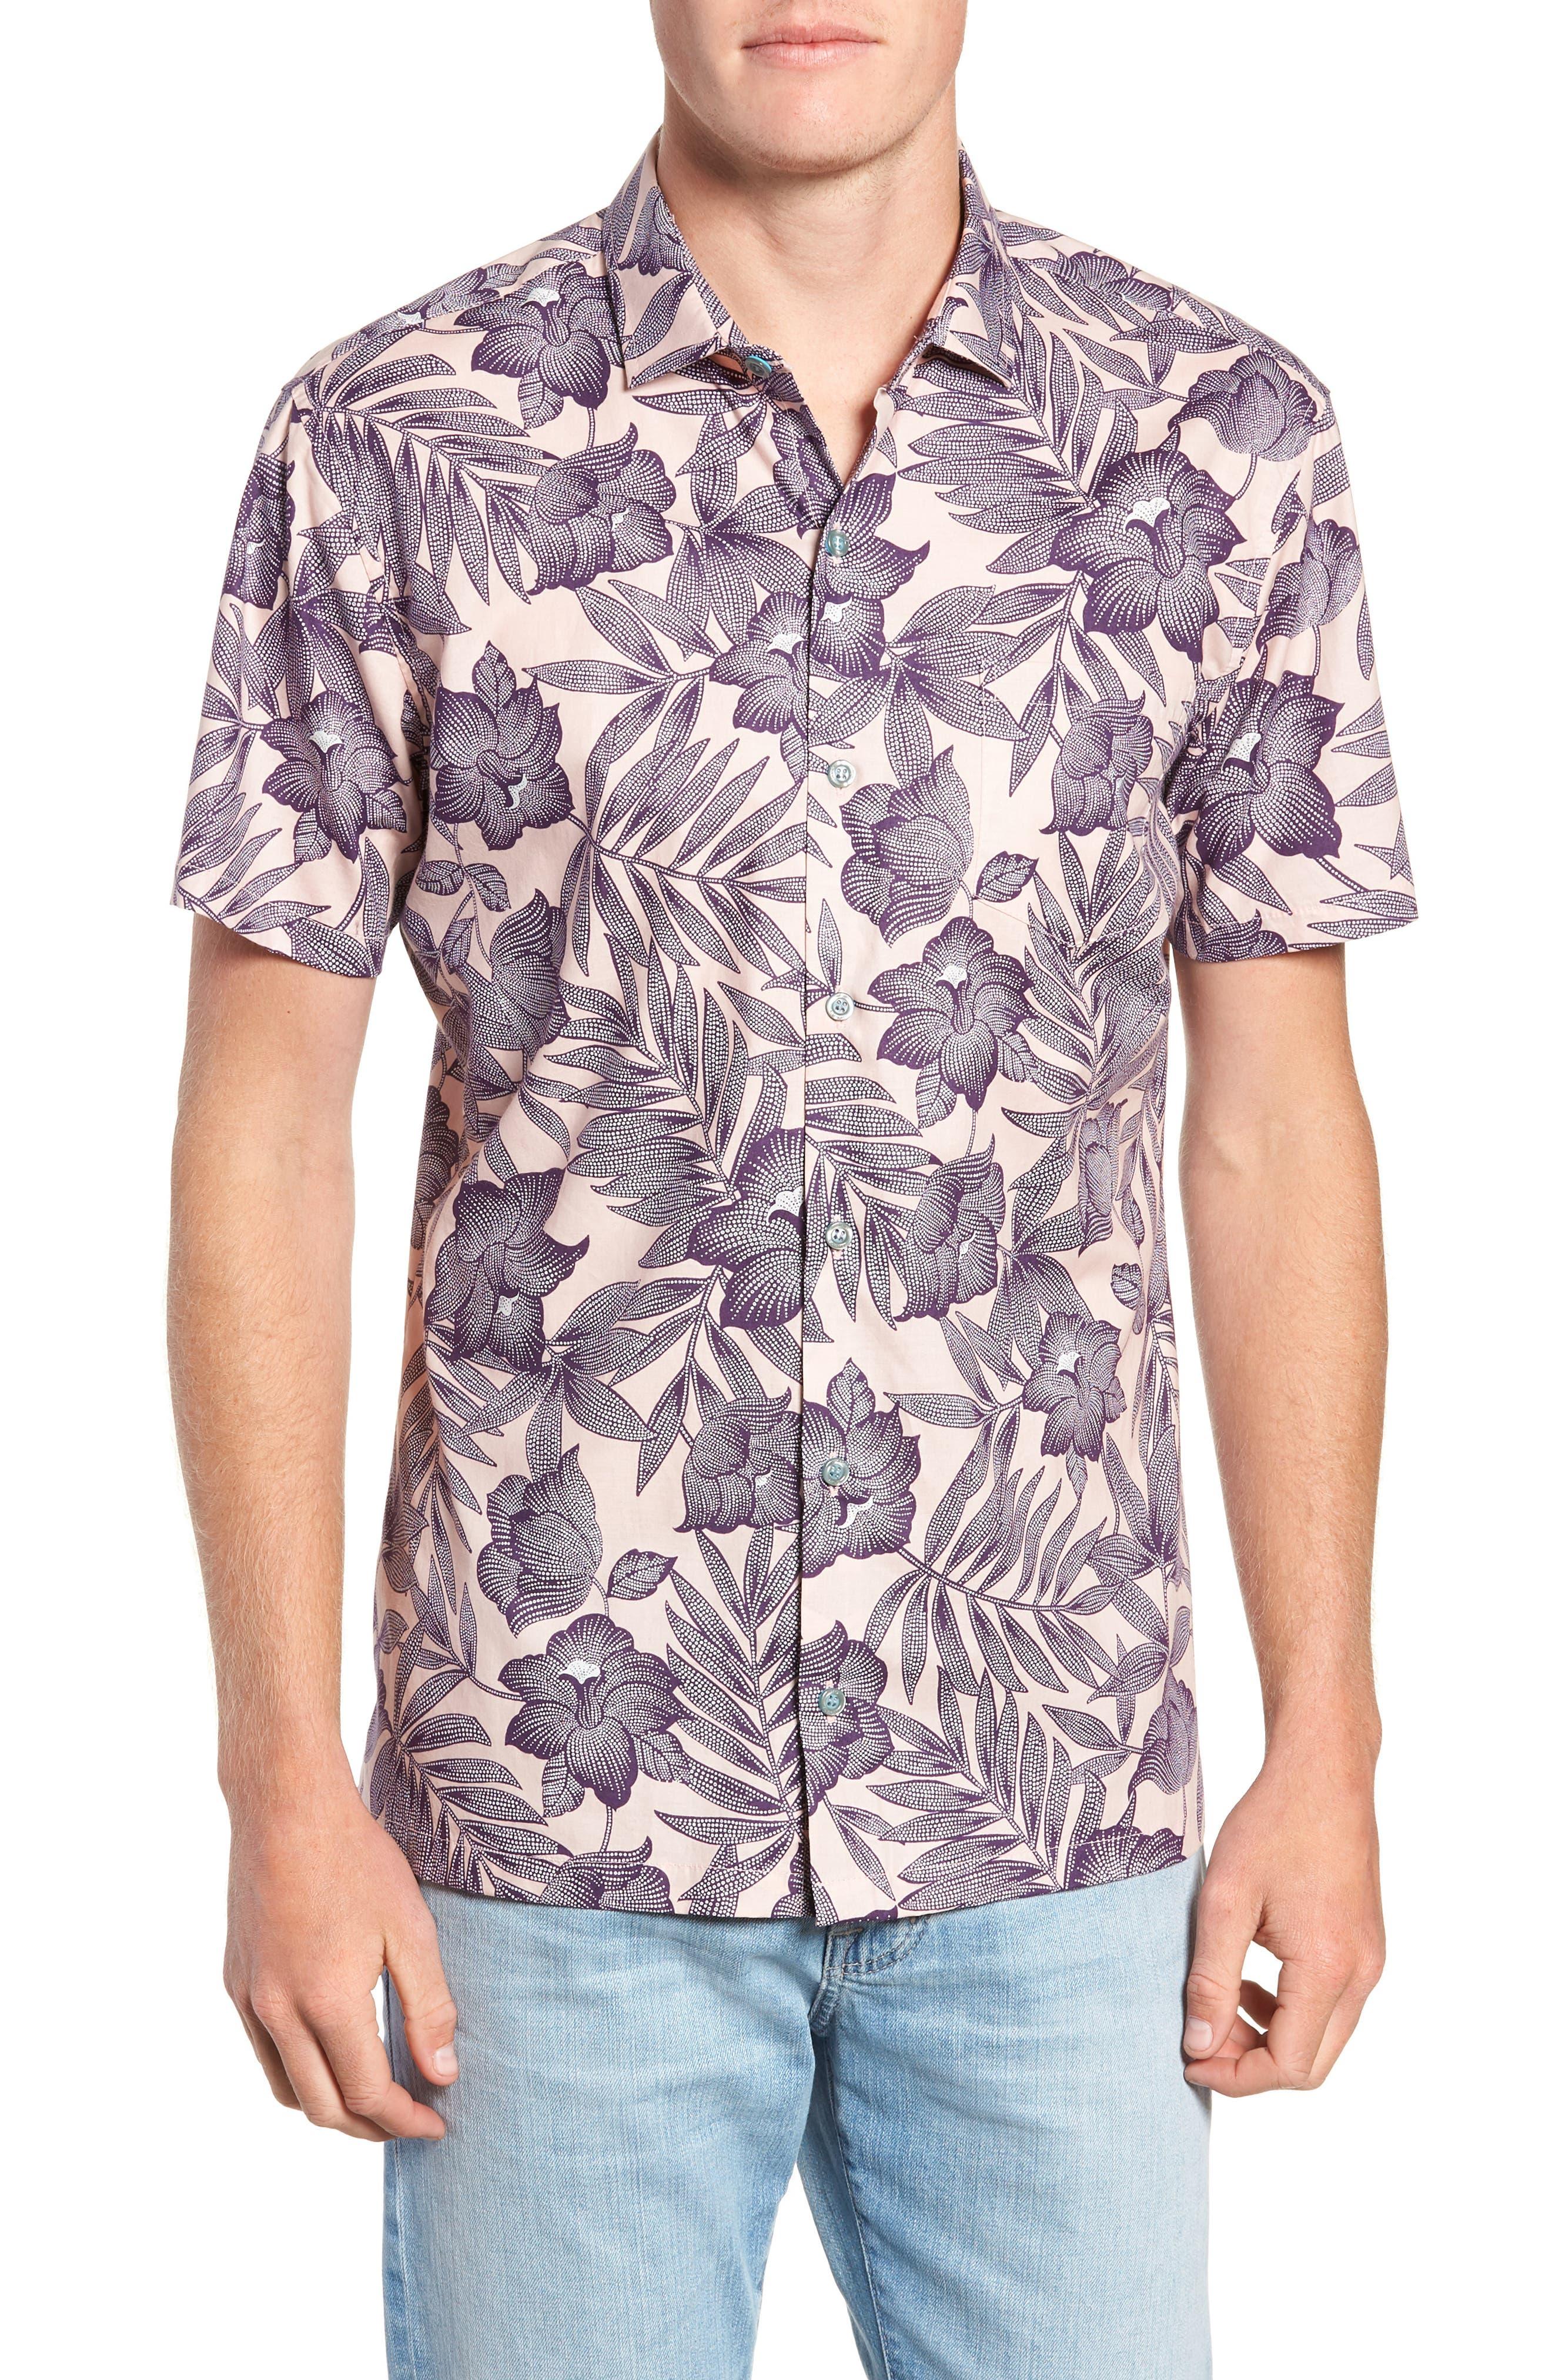 TORI RICHARD, Pollenesia Regular Fit Sport Shirt, Main thumbnail 1, color, PINK